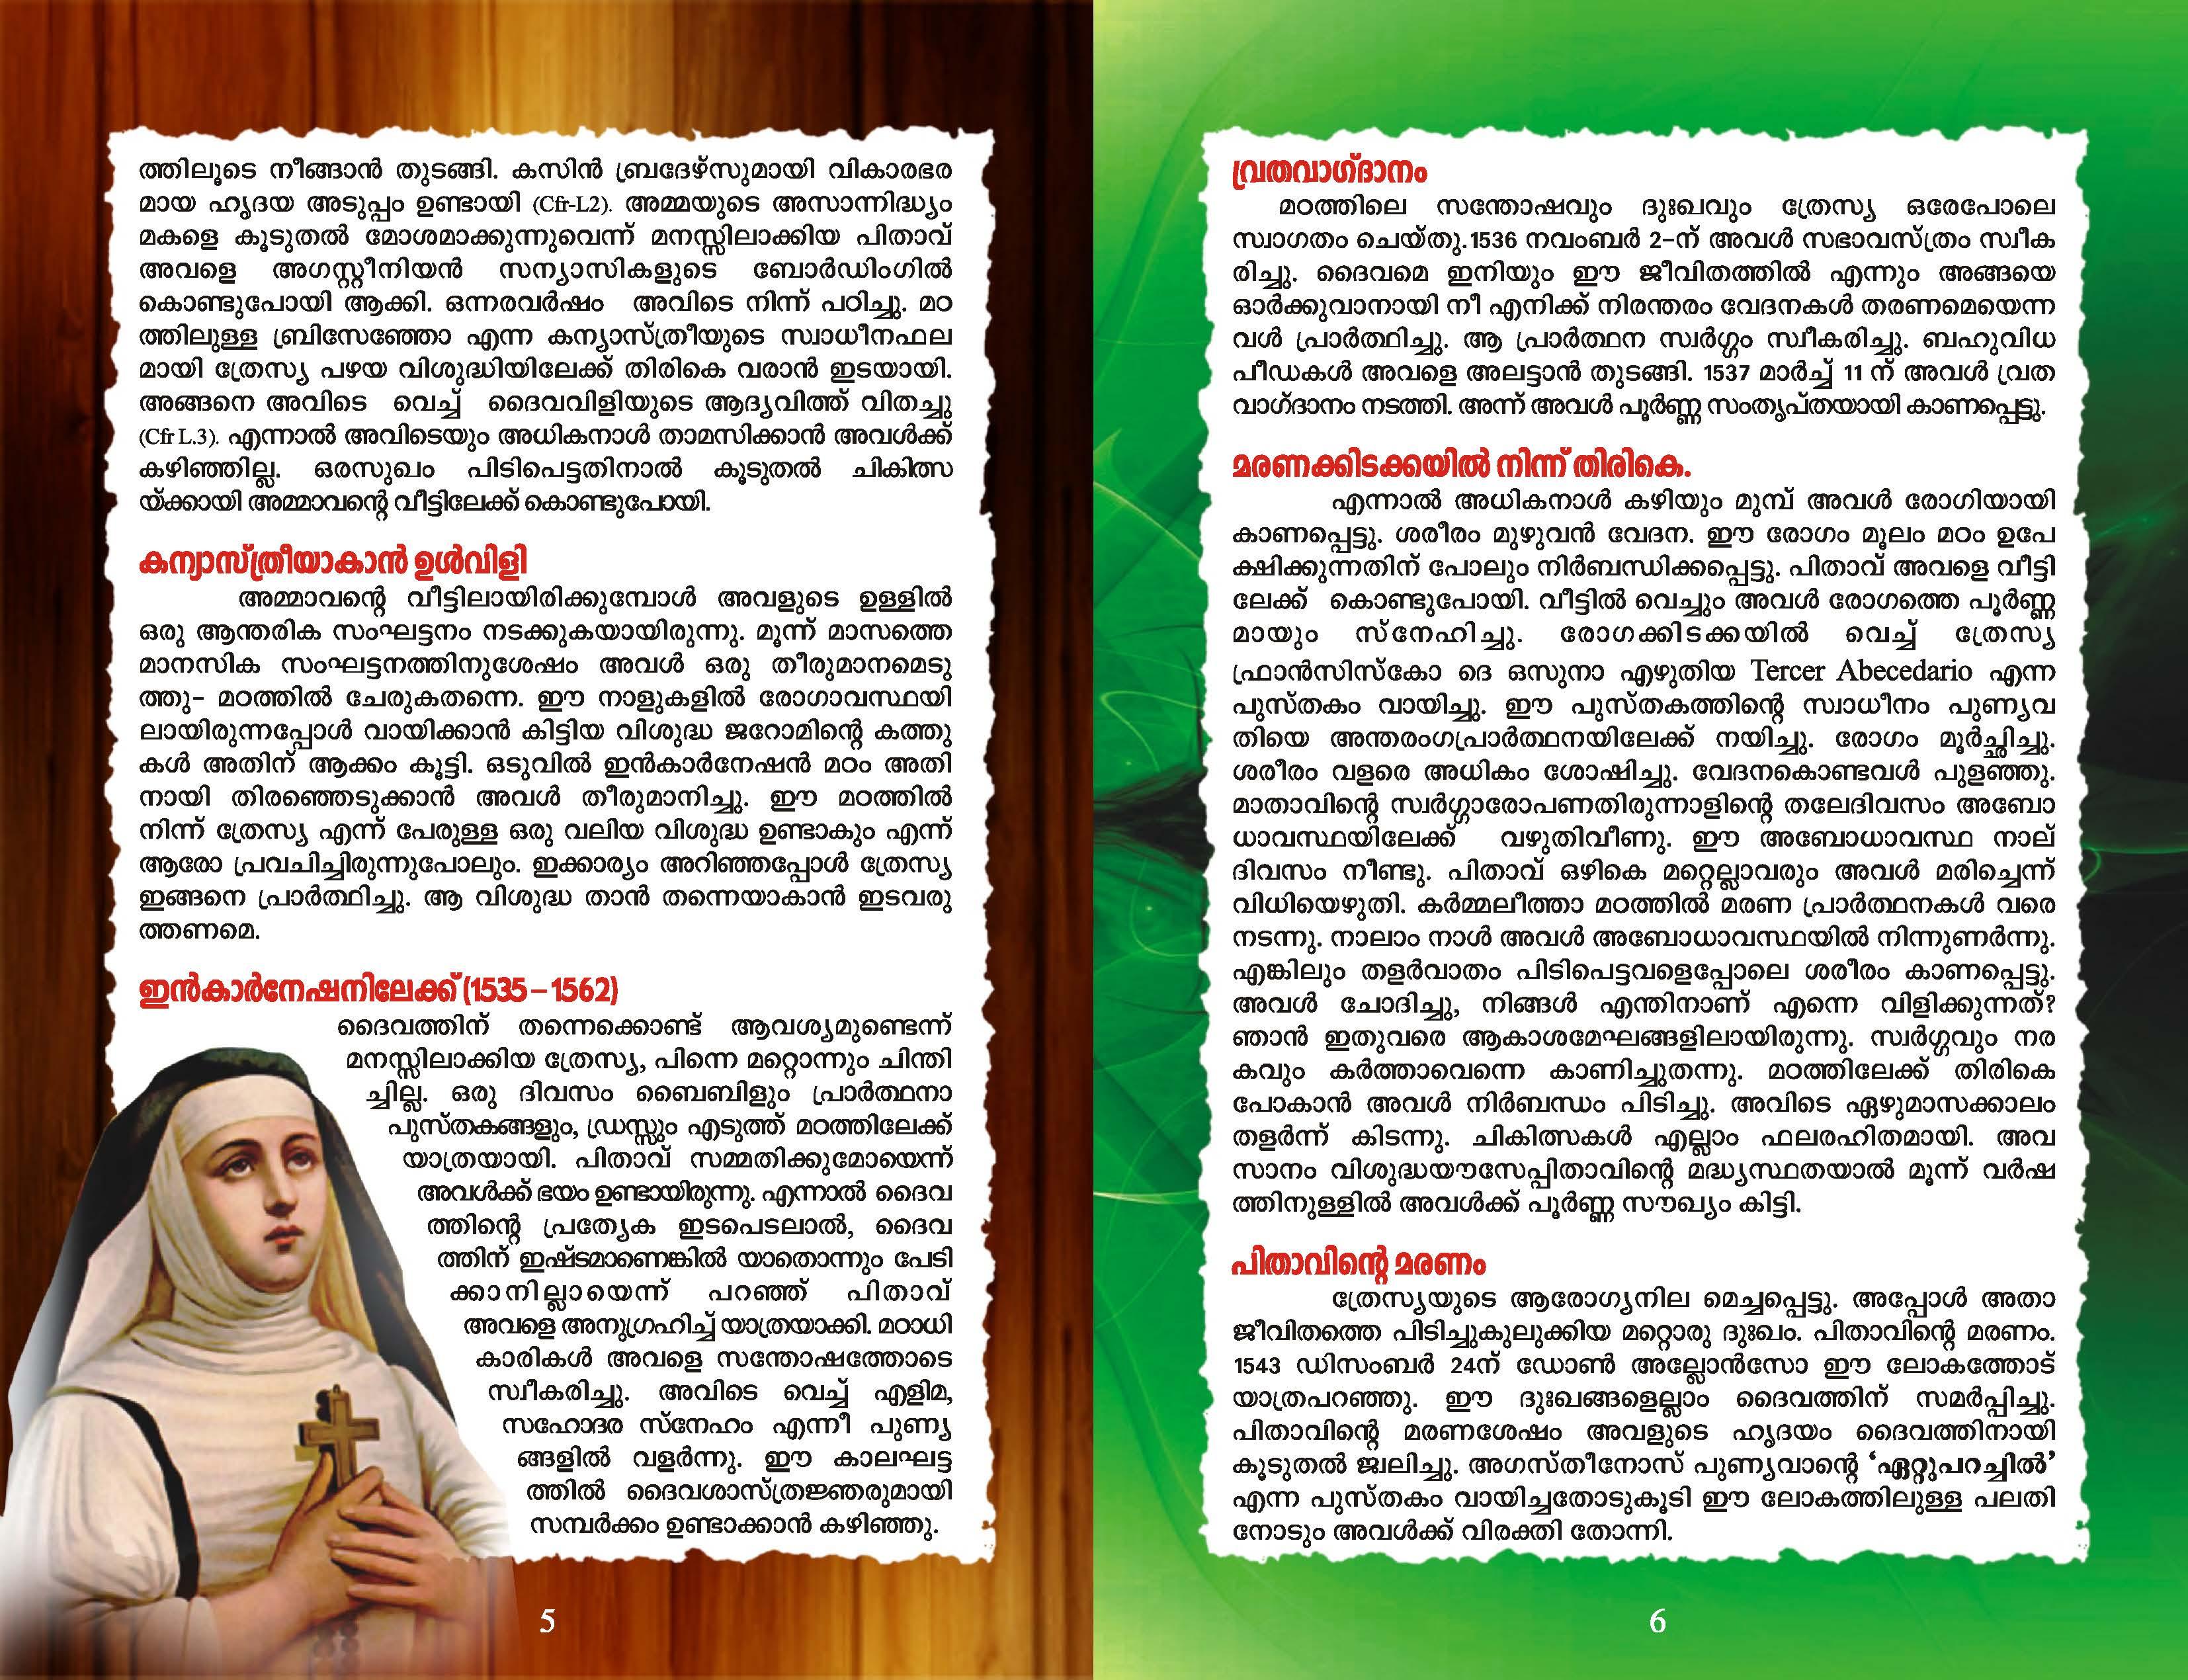 St Theresa of Avila_Page_05